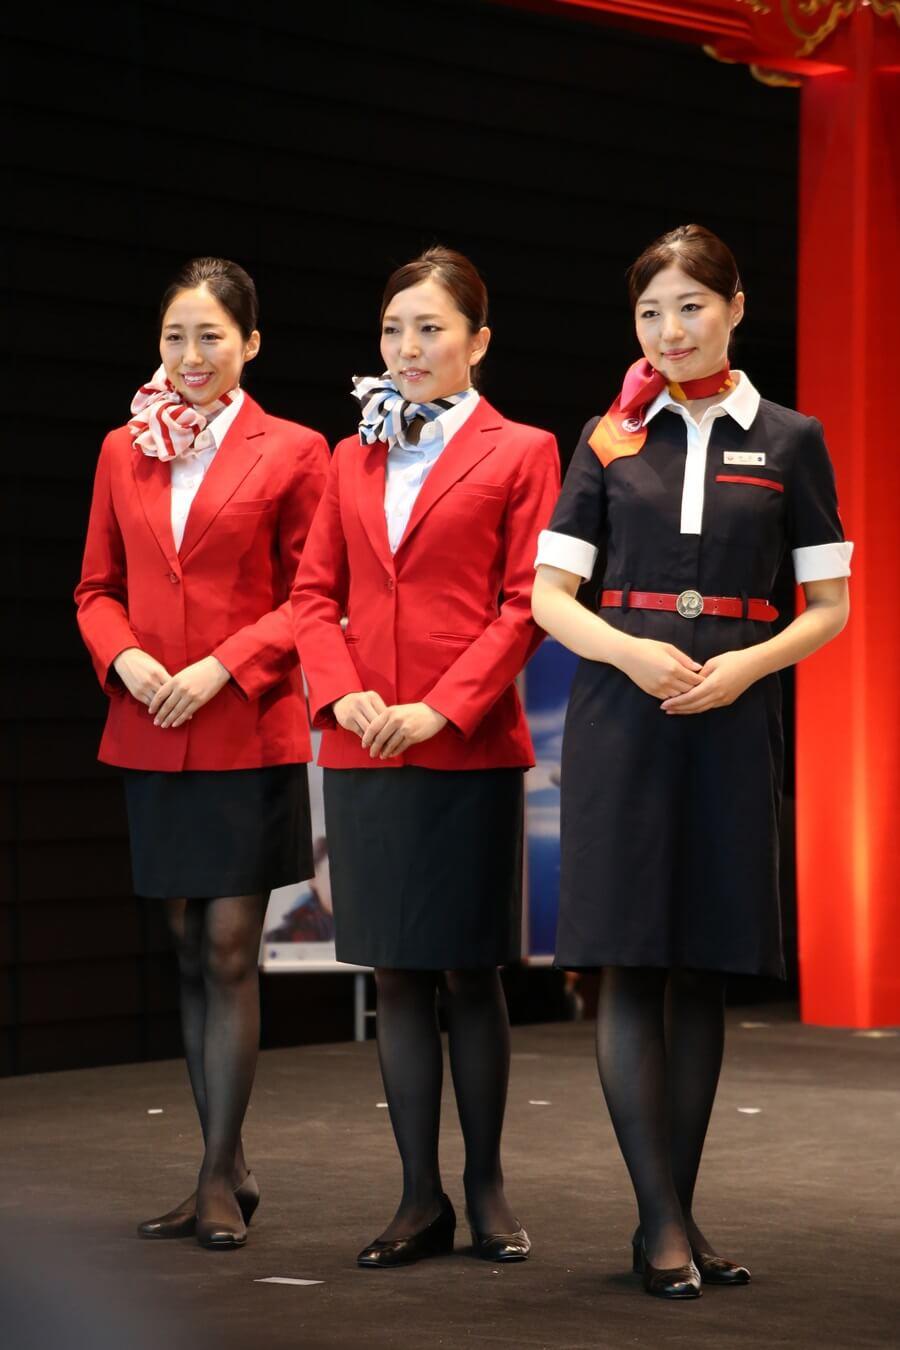 JEX制服 JALとJEX客室乗務員歴代制服ファッションショー 客室乗務員 スチワーデス 歴代ユニフォーム 制服 空の日フェスティバル JAL fashion show JAL Express JEX (4)